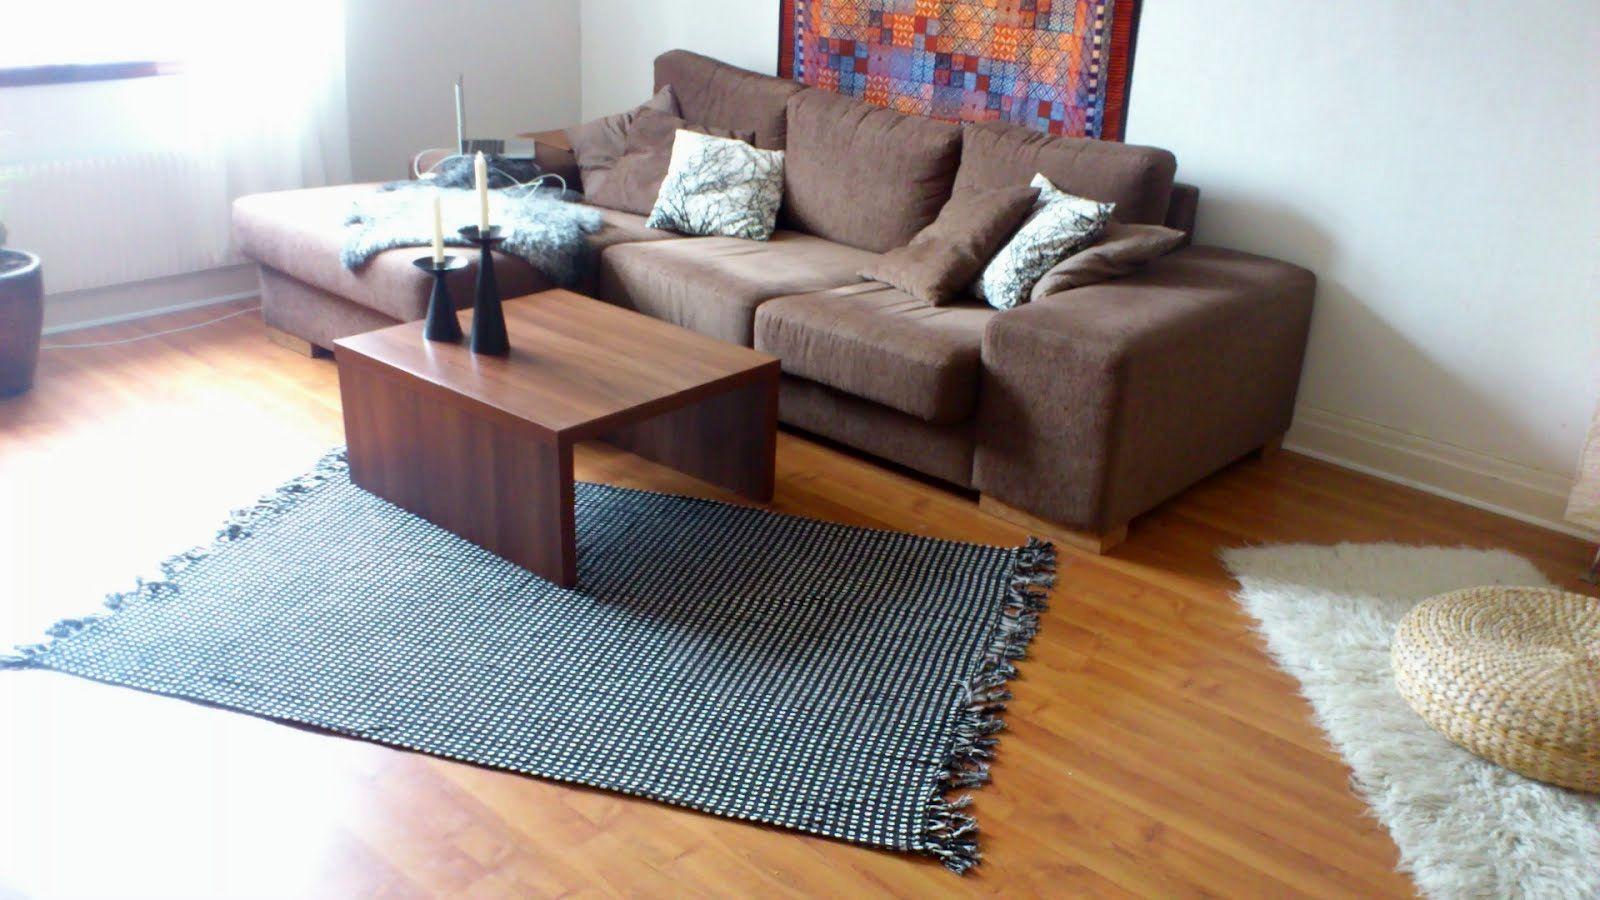 beautiful home goods bathroom rugs image-Luxury Home Goods Bathroom Rugs Collection